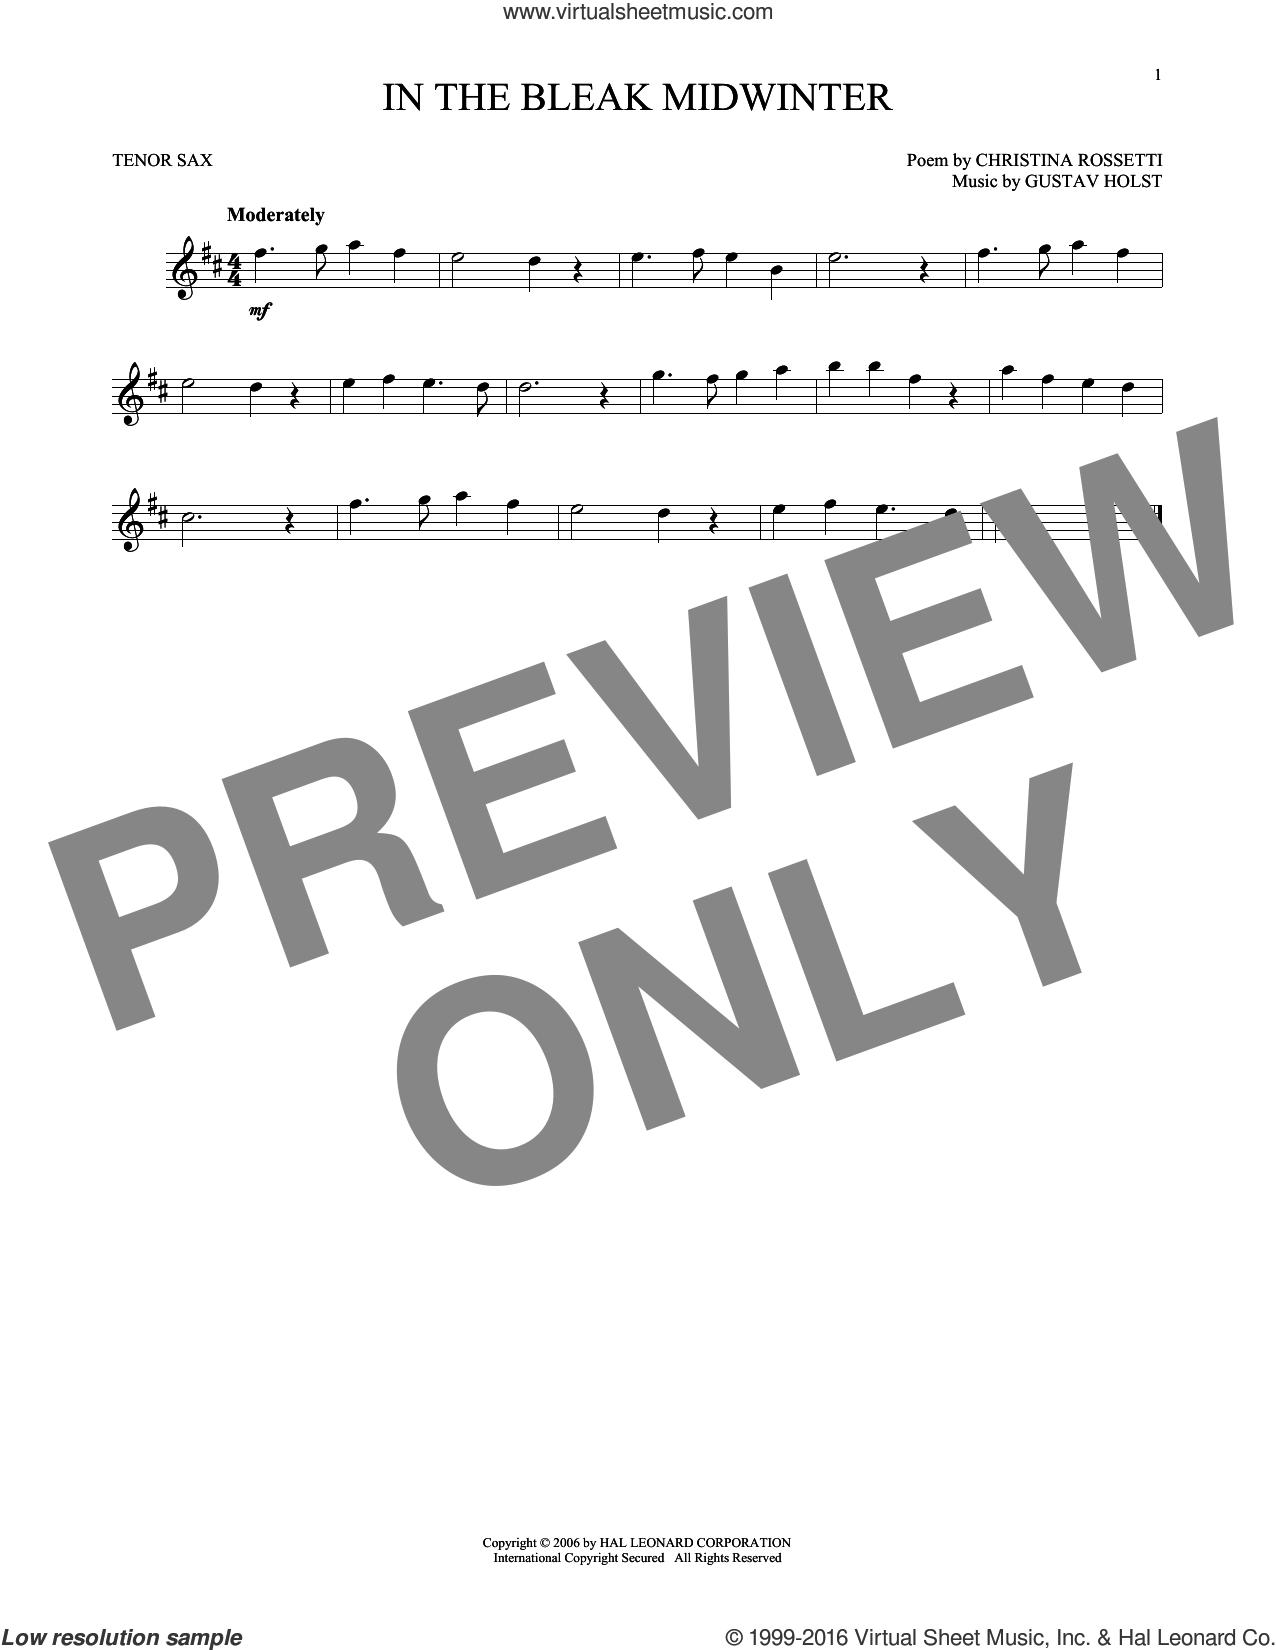 In The Bleak Midwinter sheet music for tenor saxophone solo by Gustav Holst and Christina Rossetti, intermediate skill level